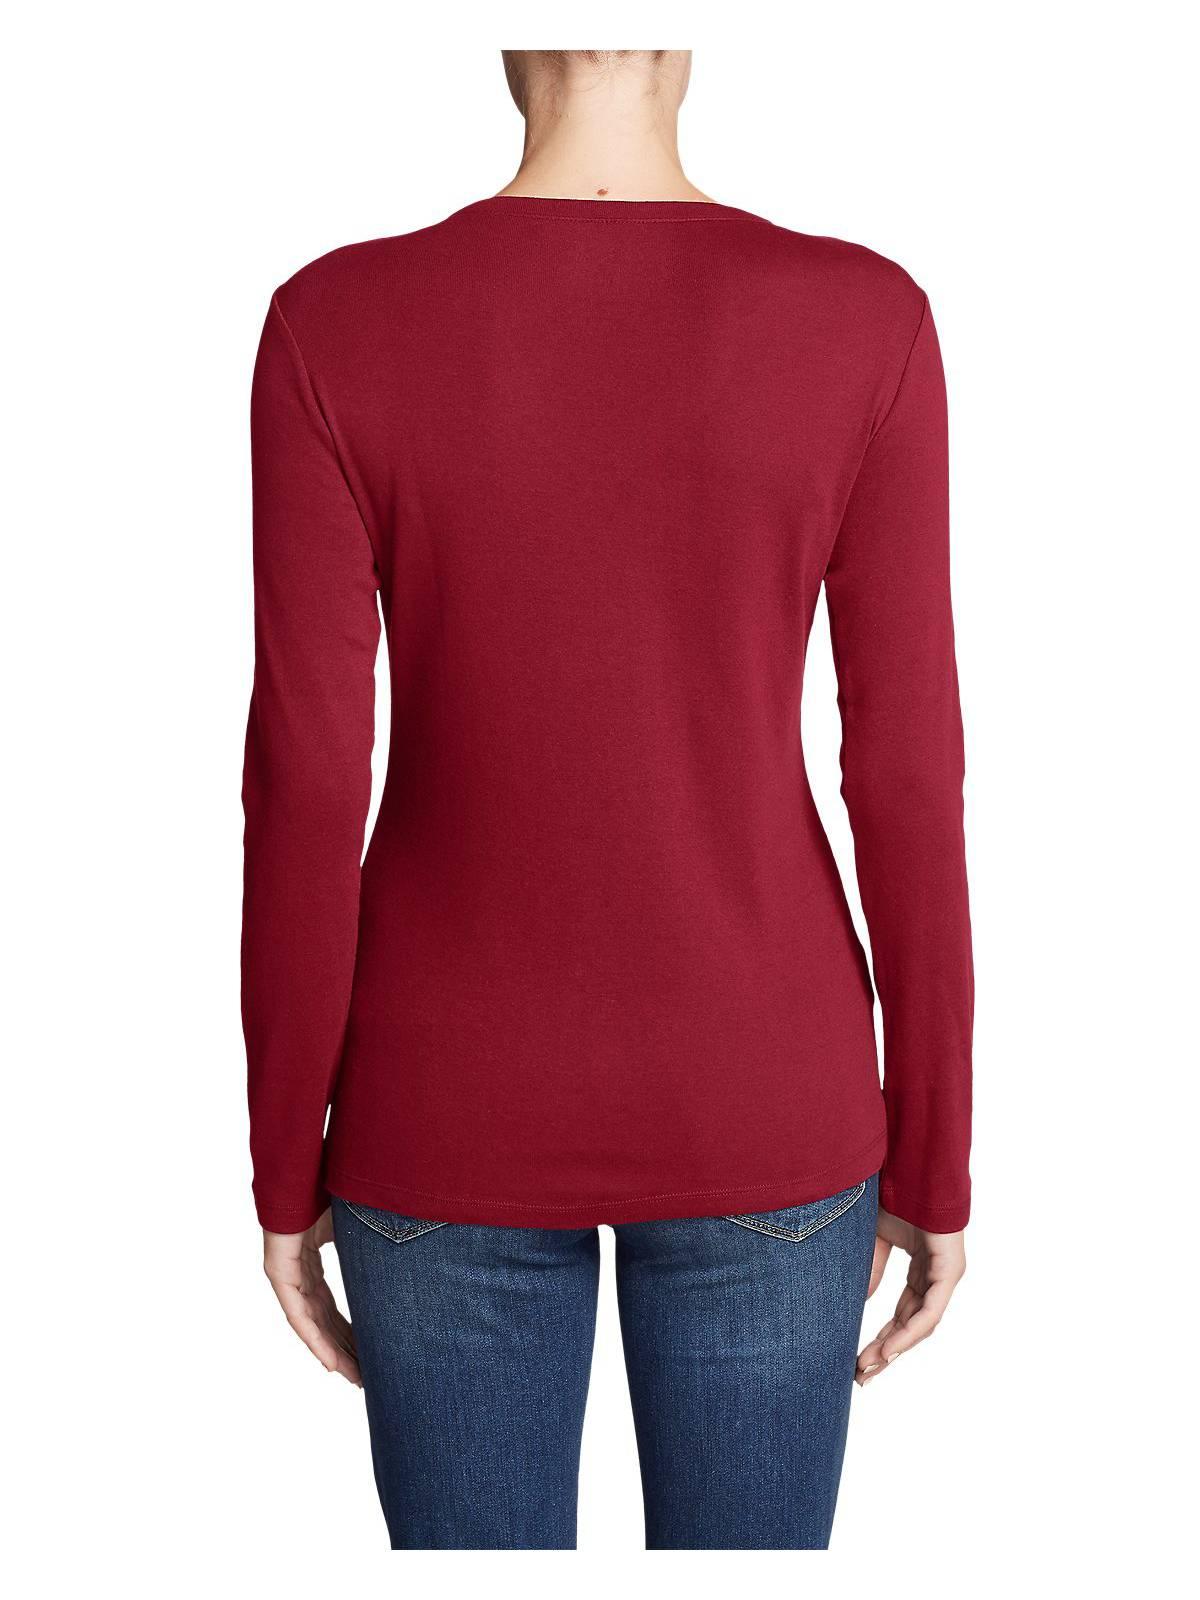 Eddie-Bauer-Women-039-s-Favorite-Long-Sleeve-V-Neck-T-Shirt thumbnail 29